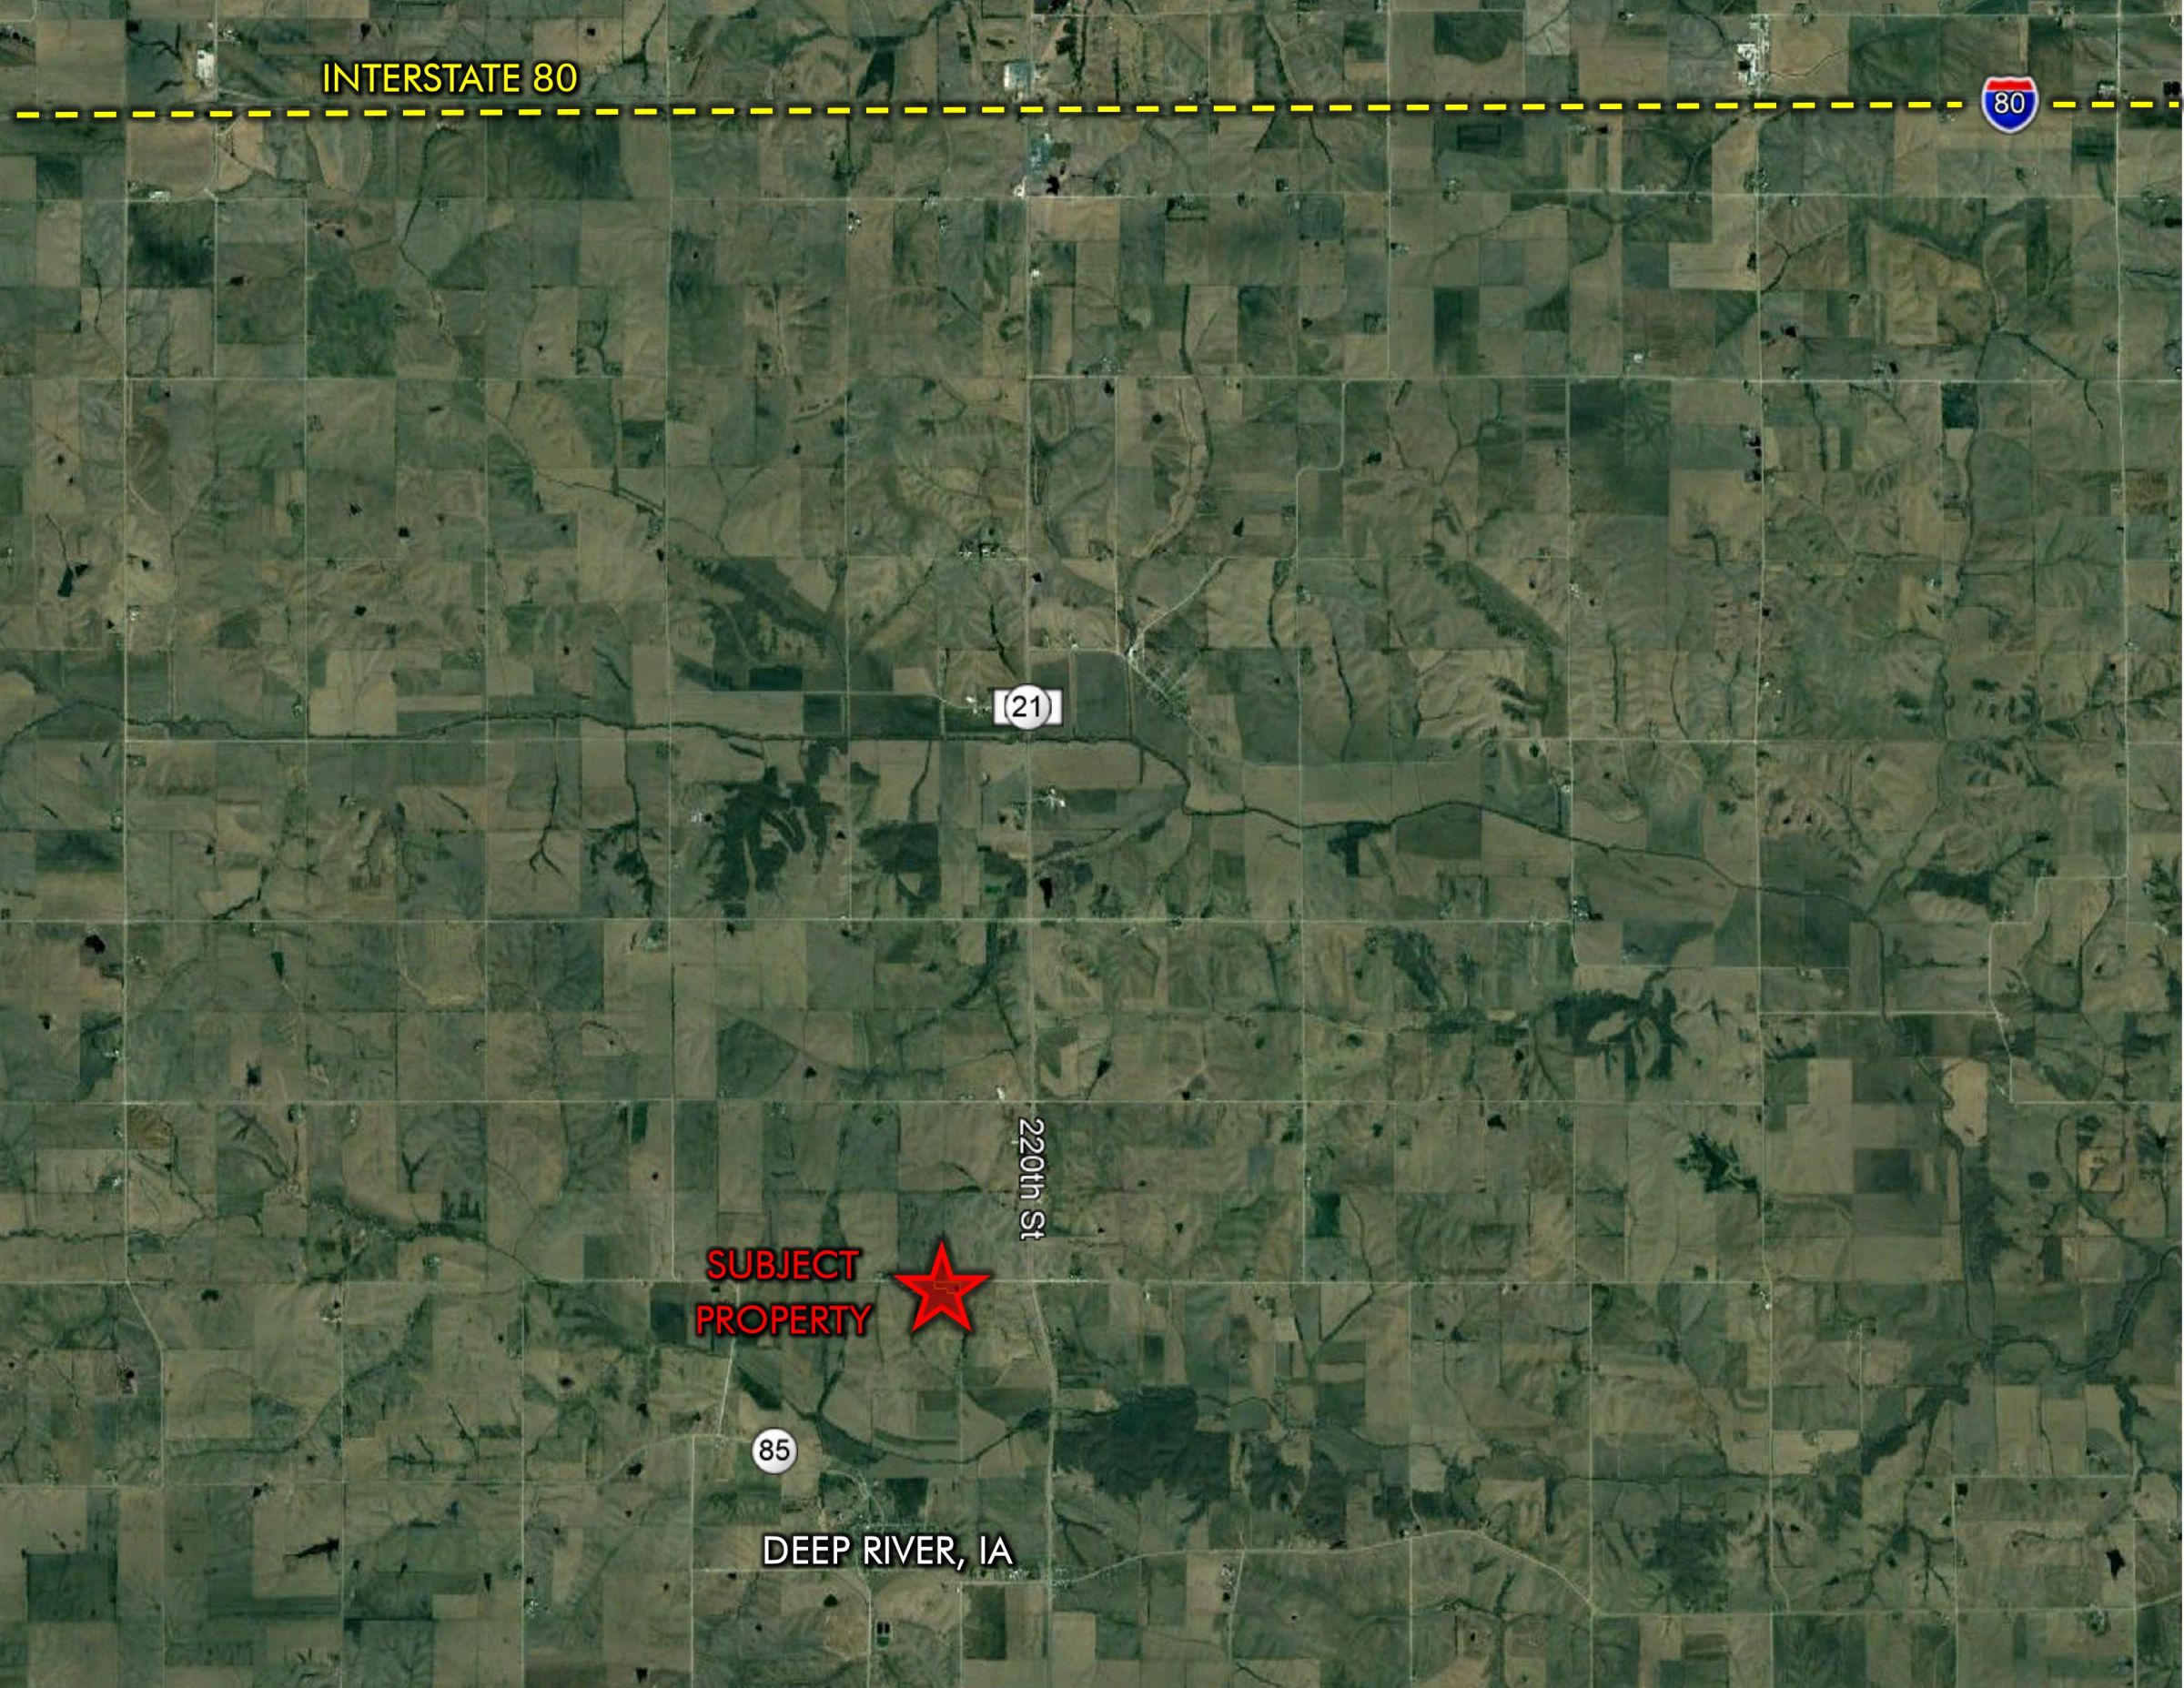 residential-land-poweshiek-county-iowa-5-acres-listing-number-15149-5-2020-08-28-195808.jpg